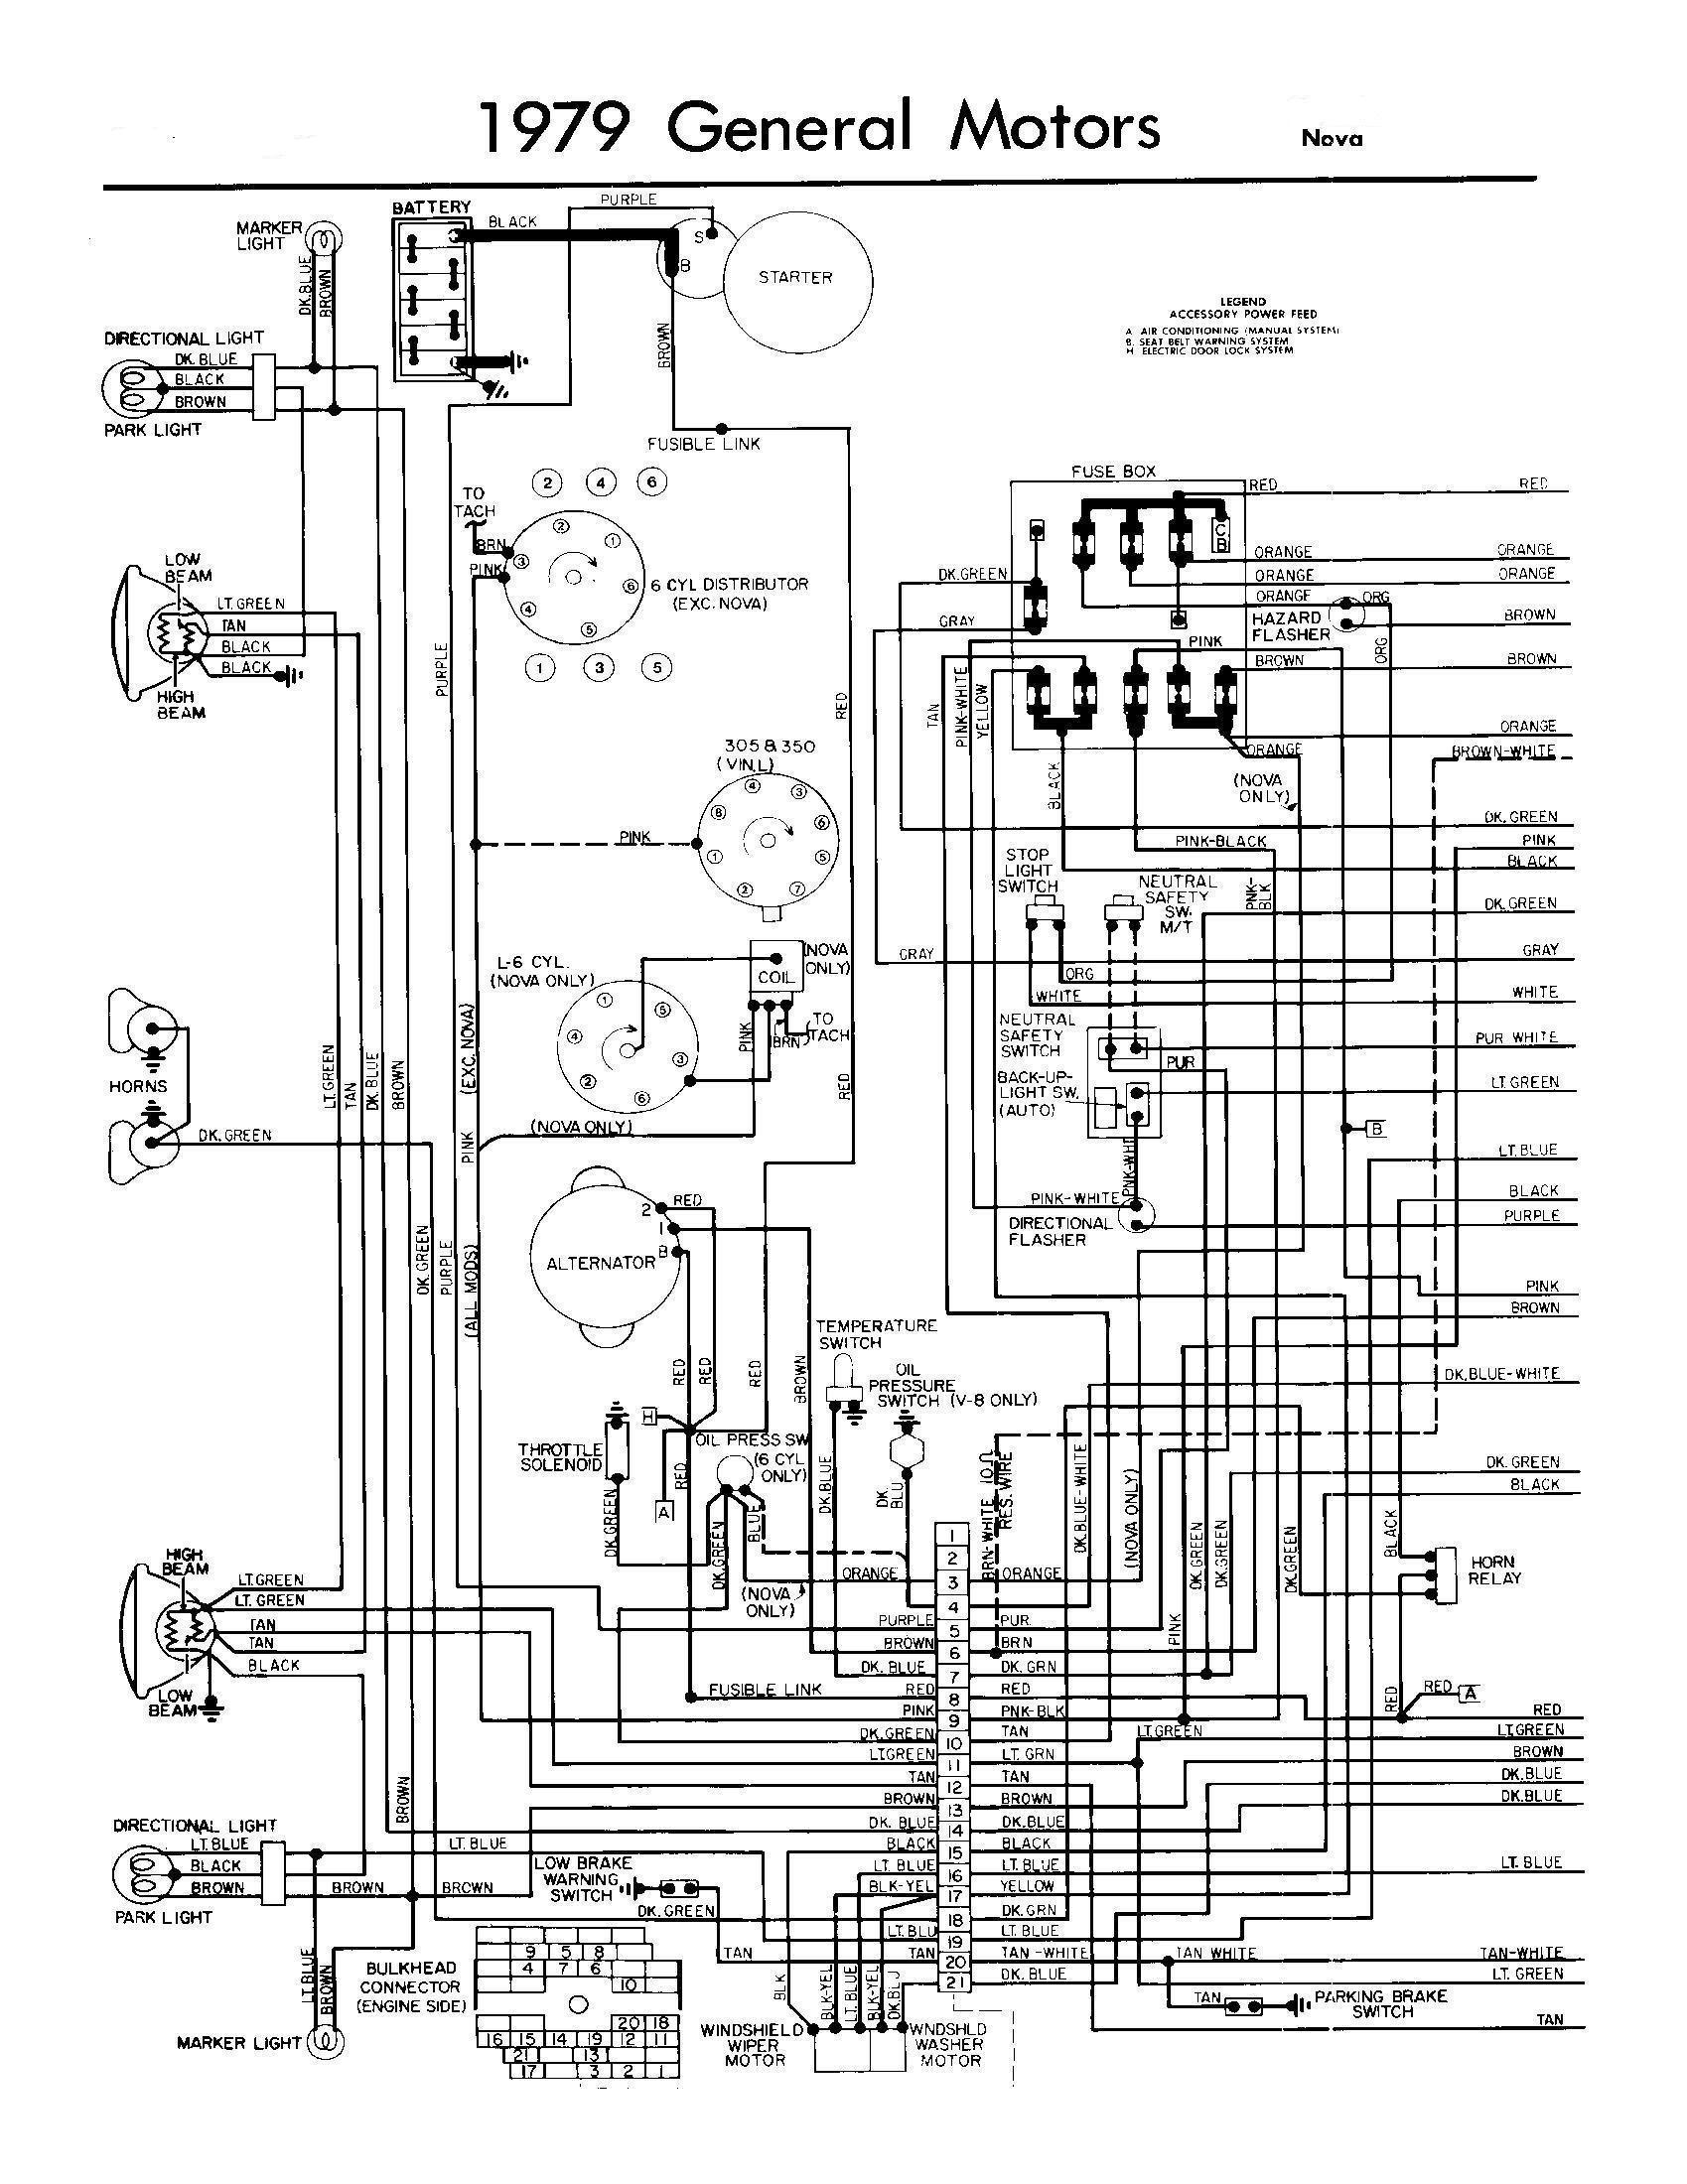 1993 Chevrolet C1500 Wiring Diagram